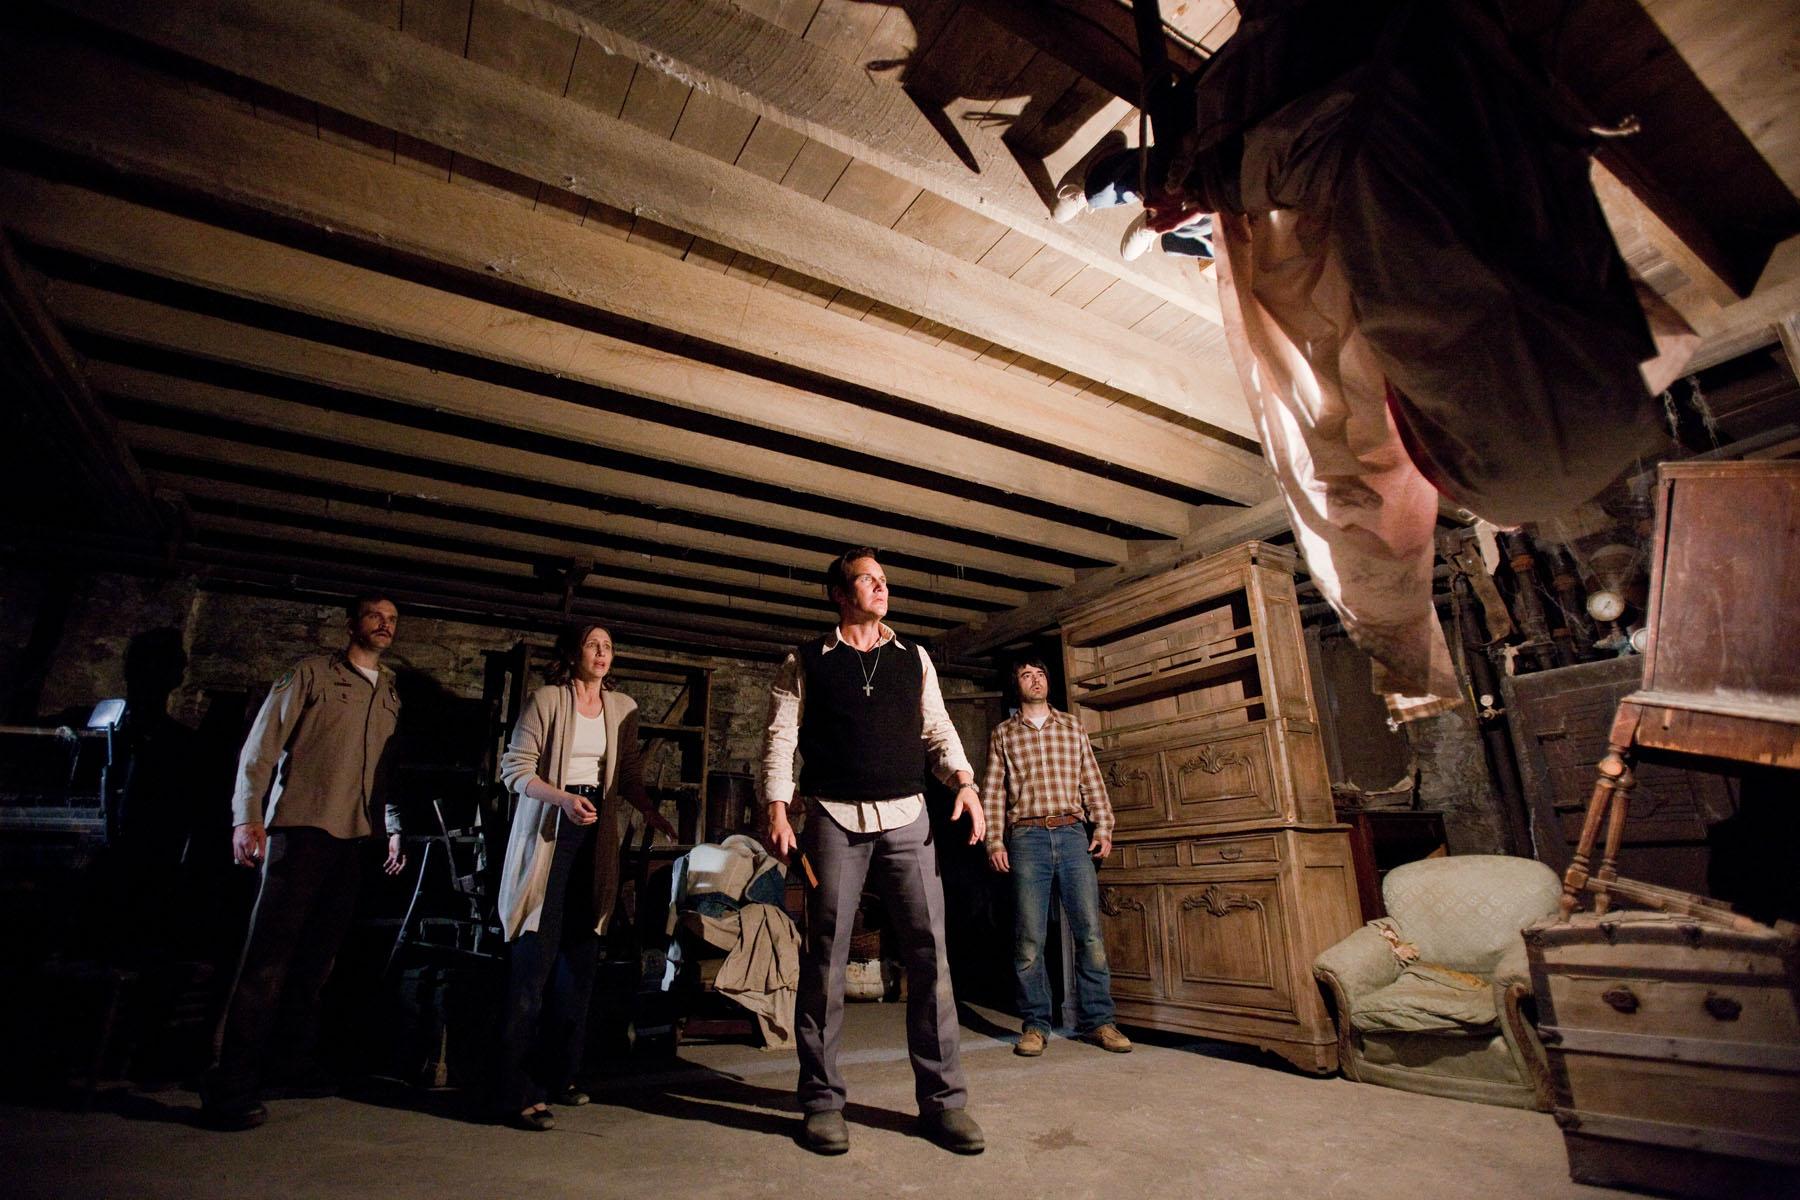 """INT PERRON HOUSE - CELLAR Carolyn flips upside down and shoots up to the ceiling John Brotherton (Brad), Vera Farmiga (Lorraine), Patrick Wilson (Ed), Ron Livingston (Roger)"""